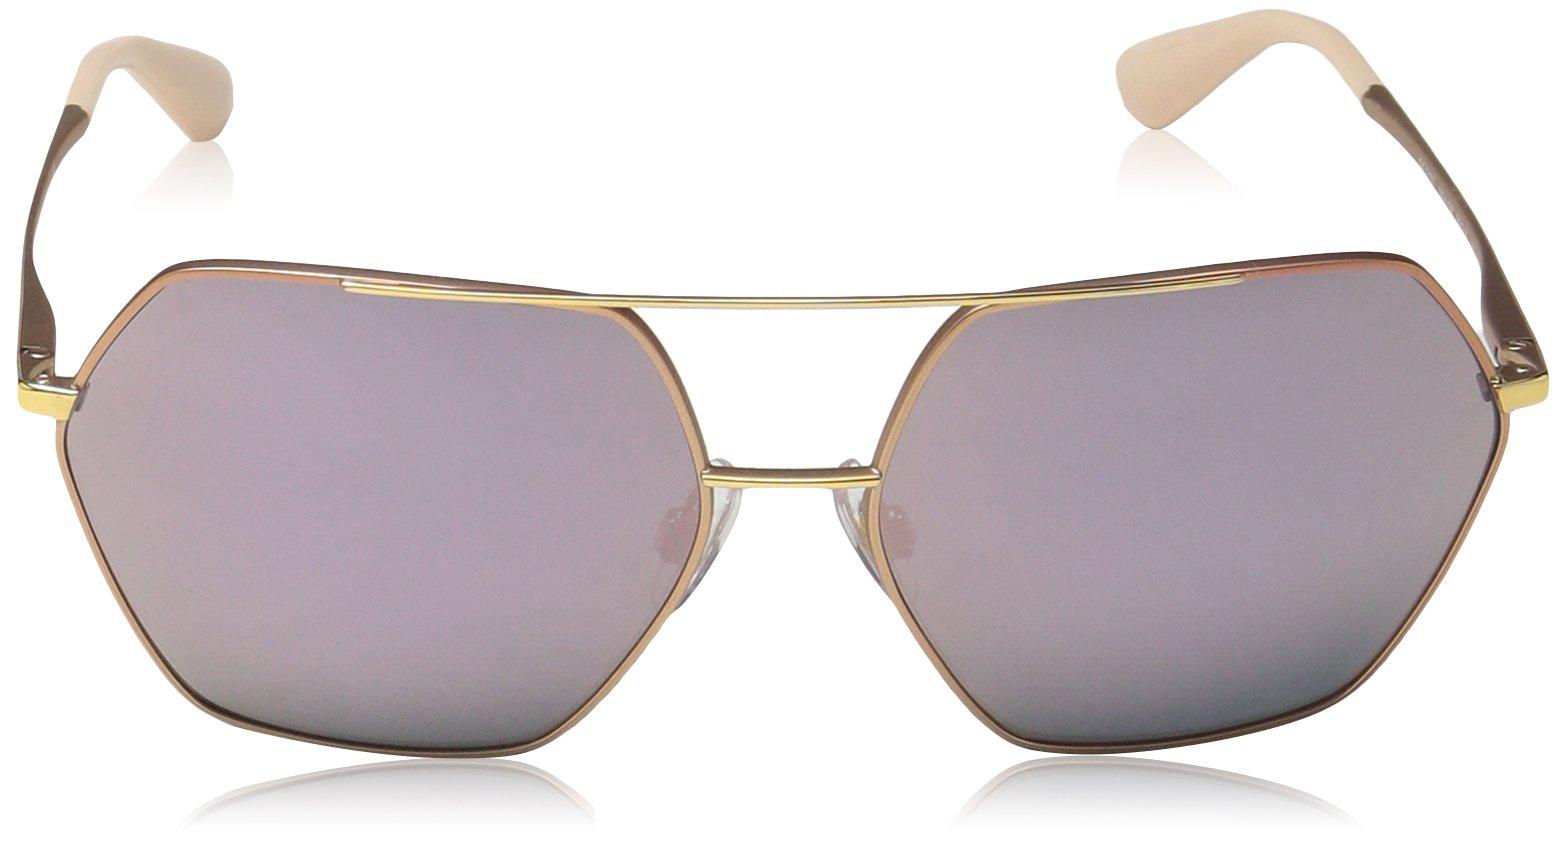 Dolce & Gabbana Women's Metal Woman Non-Polarized Iridium Square Sunglasses, Matte Pink Gold, 59.2 mm by Dolce & Gabbana (Image #2)